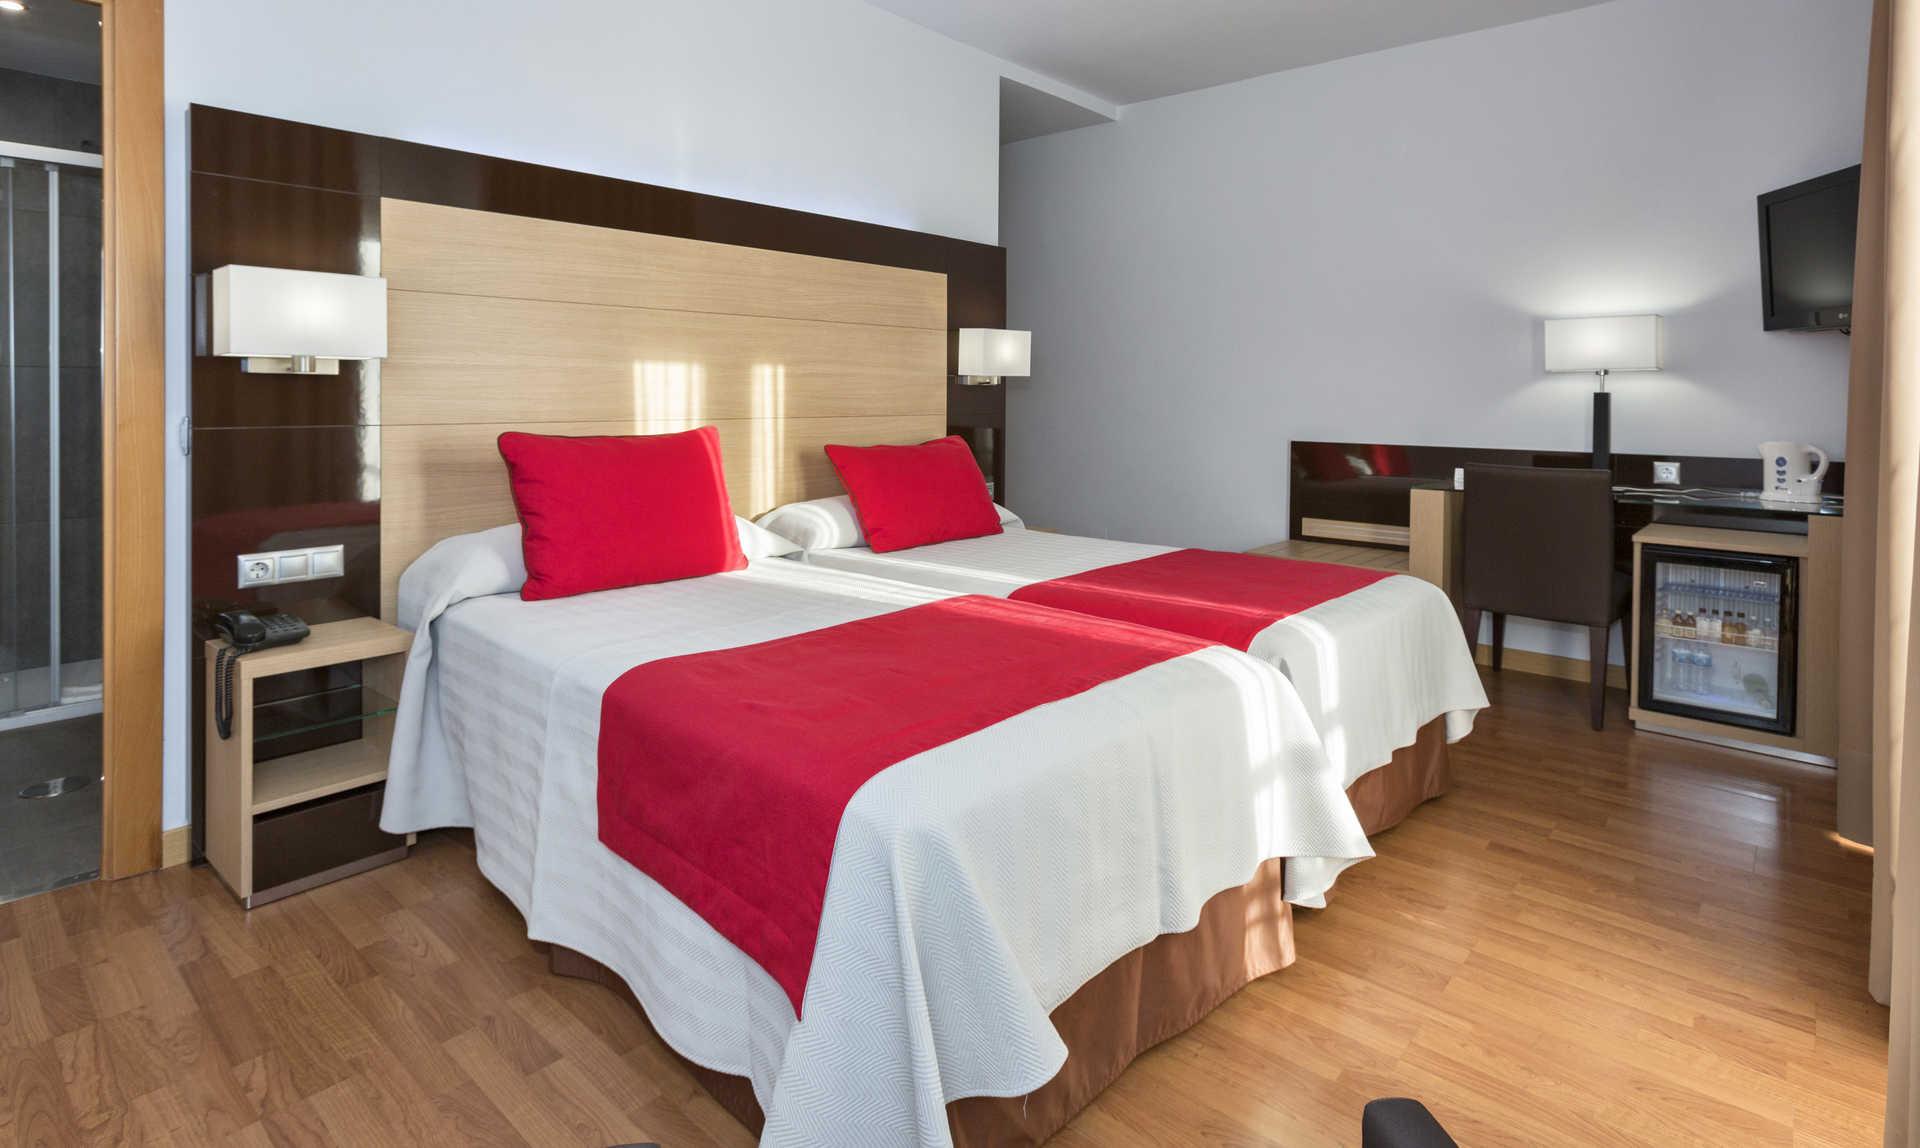 Oferta combinada Hotel Baviera. Marbella